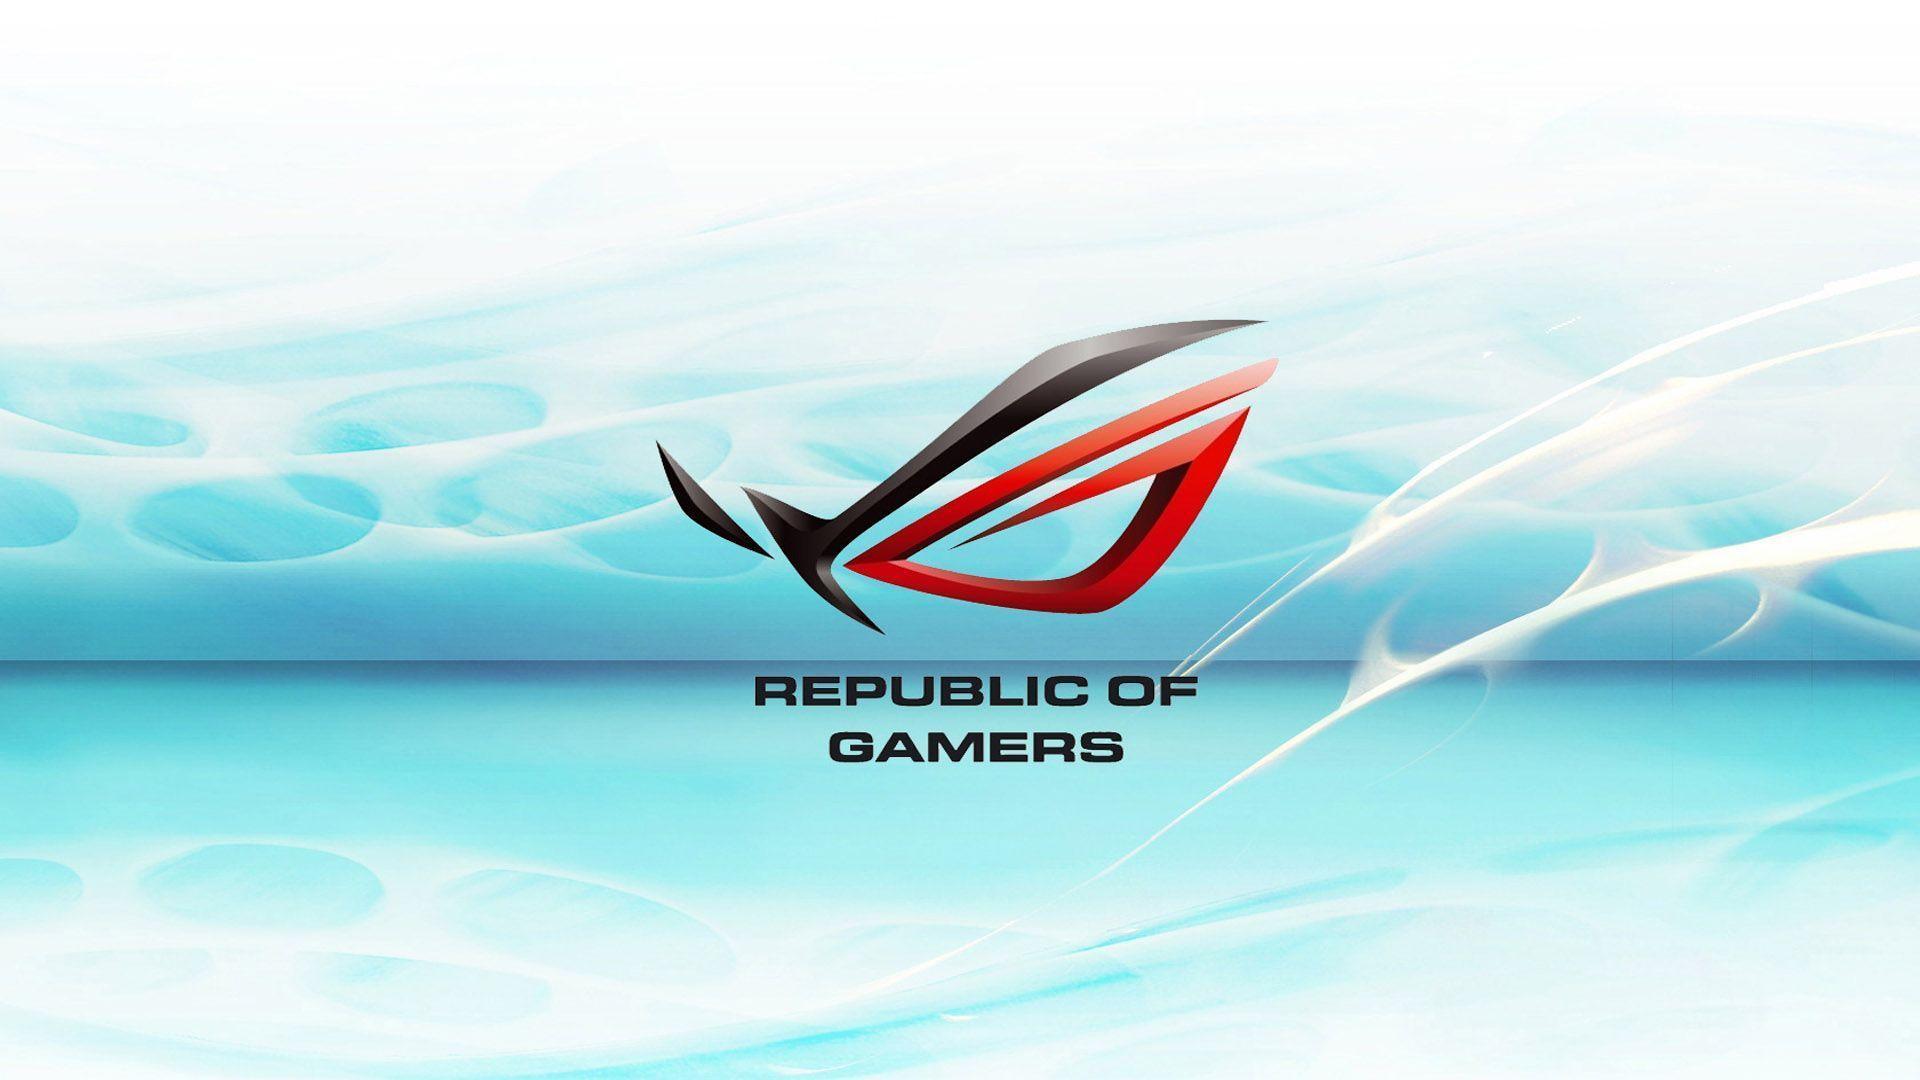 Republic Of Gamers Wallpapers - Wallpaper Cave